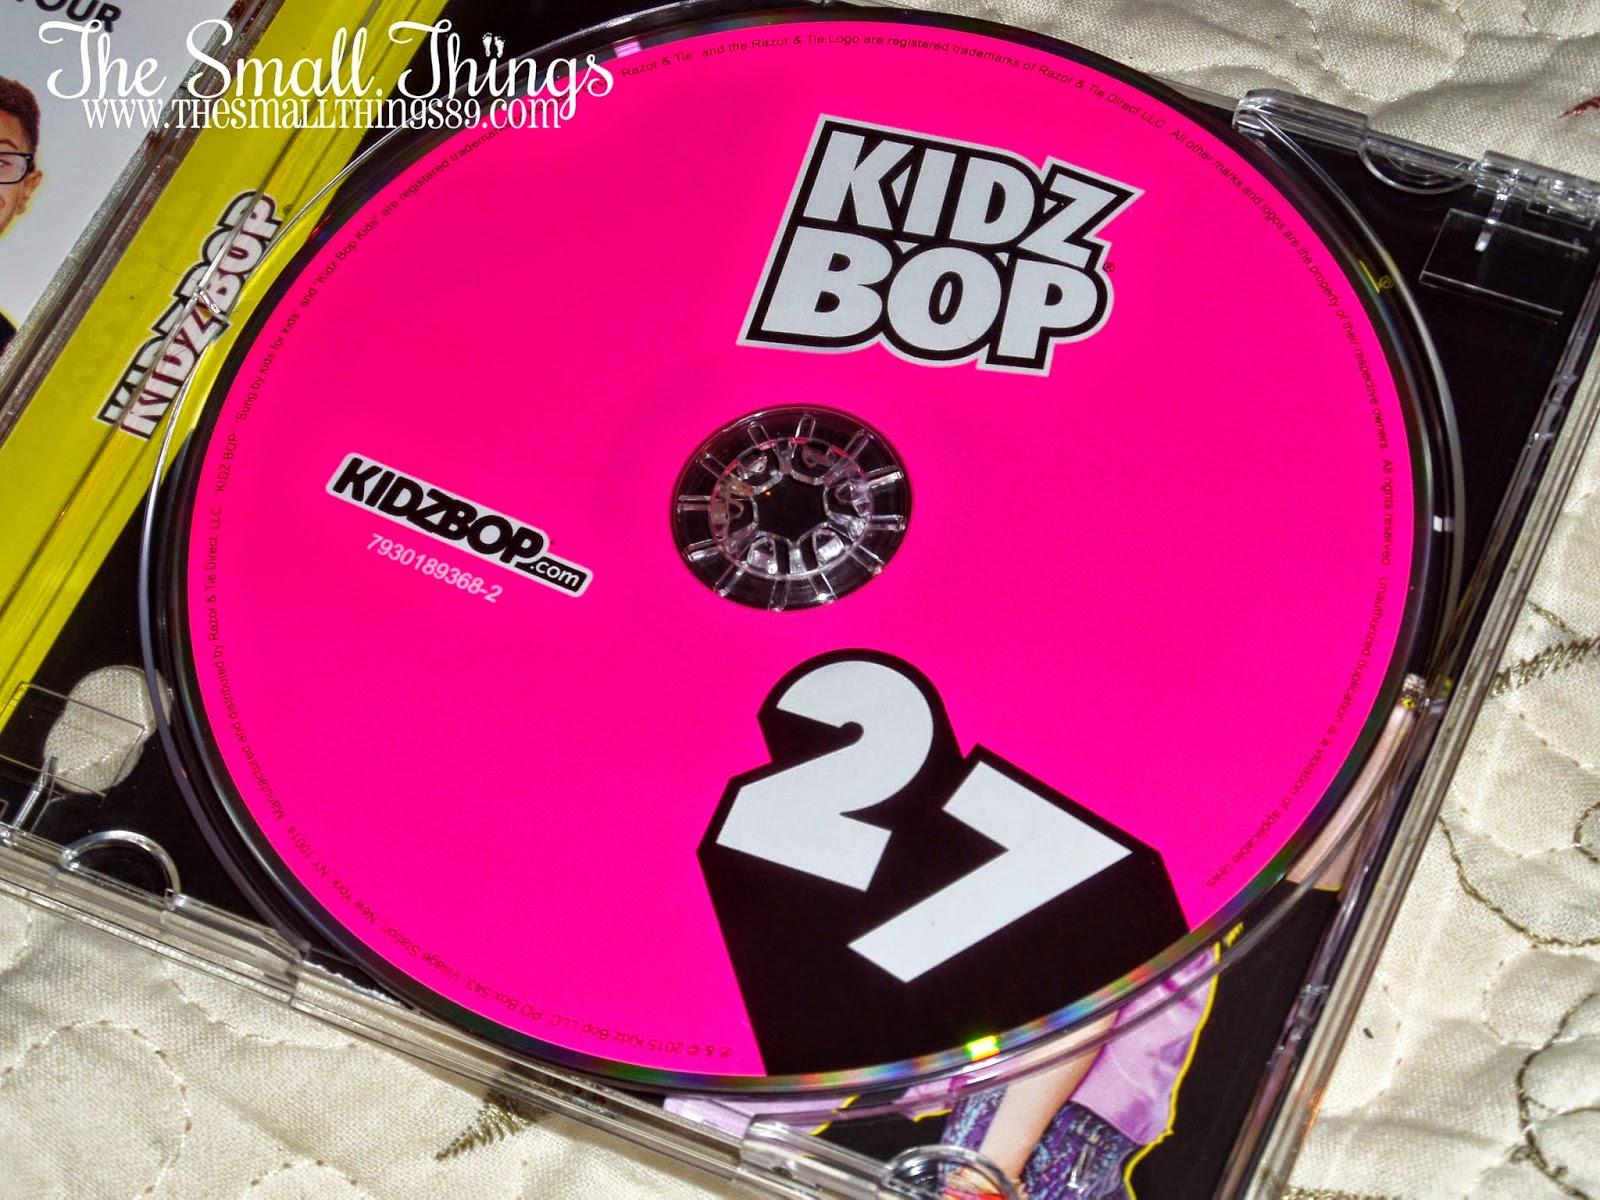 KIDZ BOP 27- Todays biggest hits sung by kids!